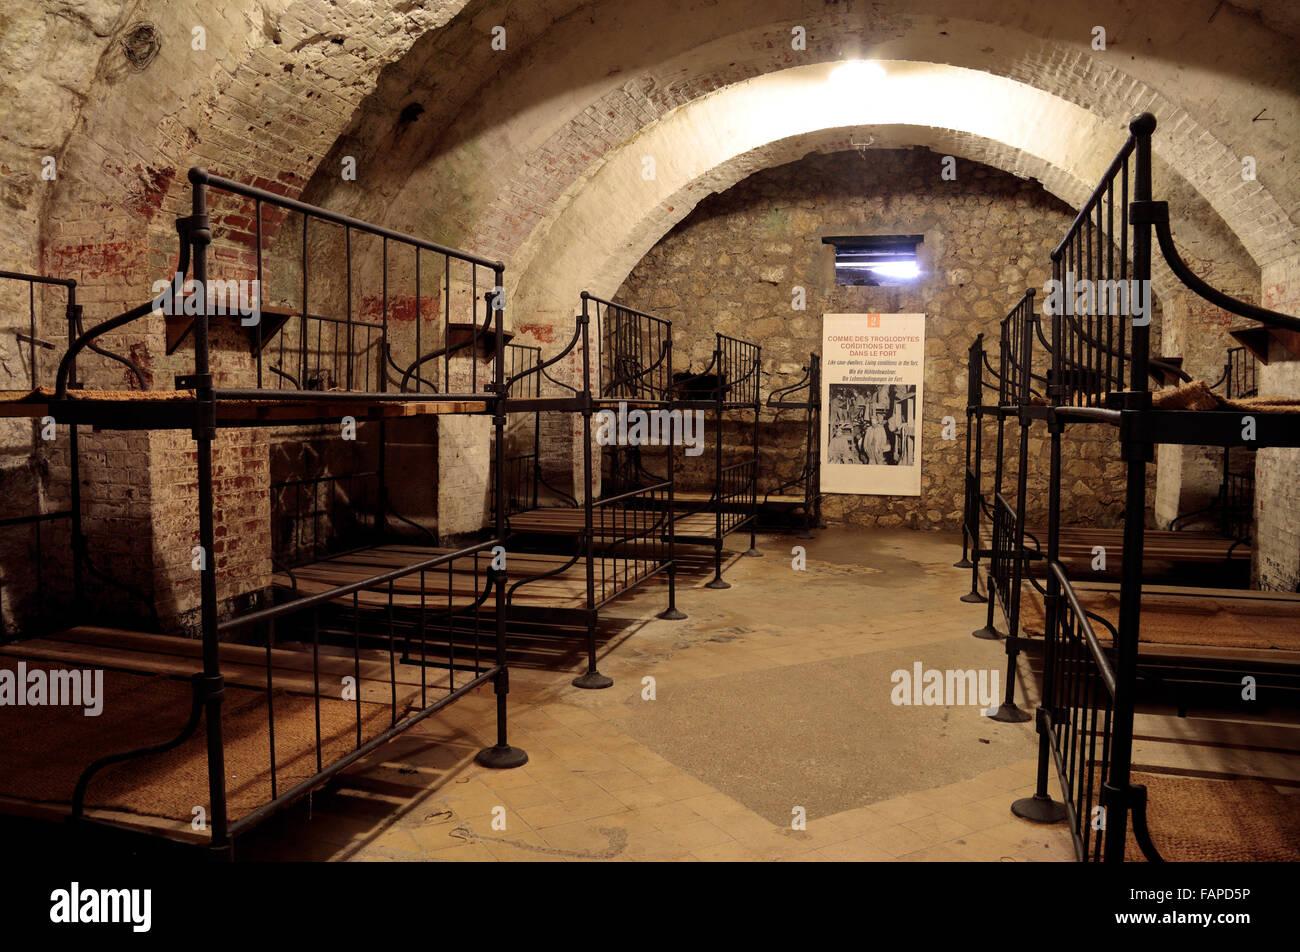 Soldier barrack room inside Fort de Vaux, Verdun, Lorraine, France. - Stock Image